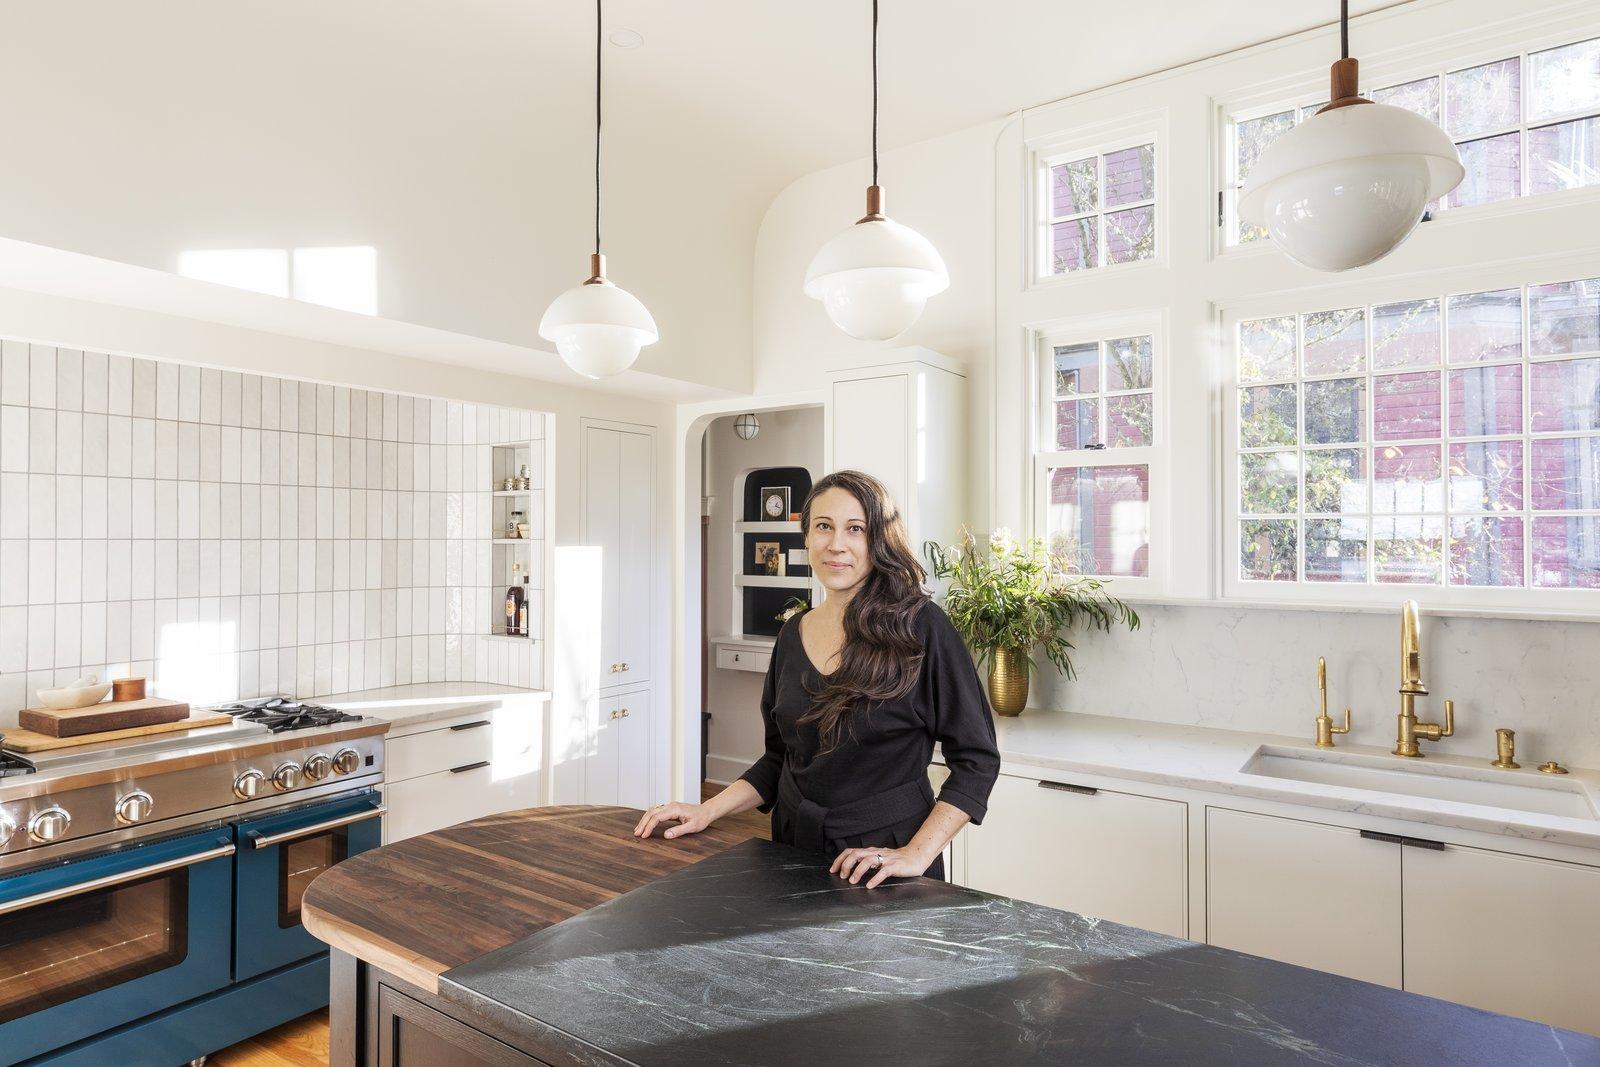 Willamette Heights Victorian Metamorphosis by Dyer Studio Kitchen